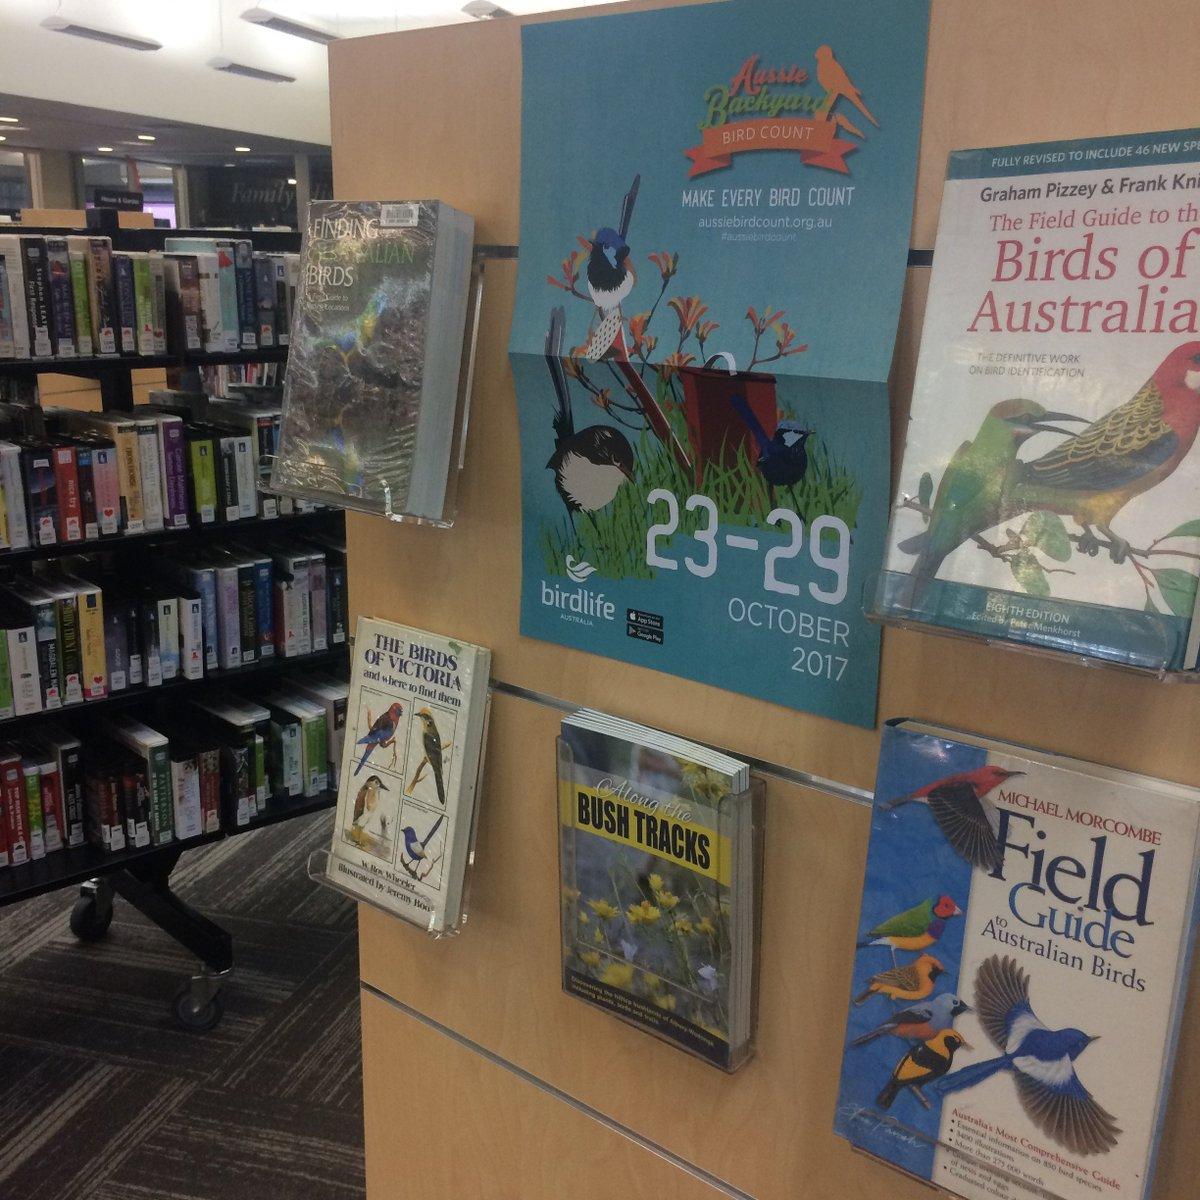 wodonga library on twitter